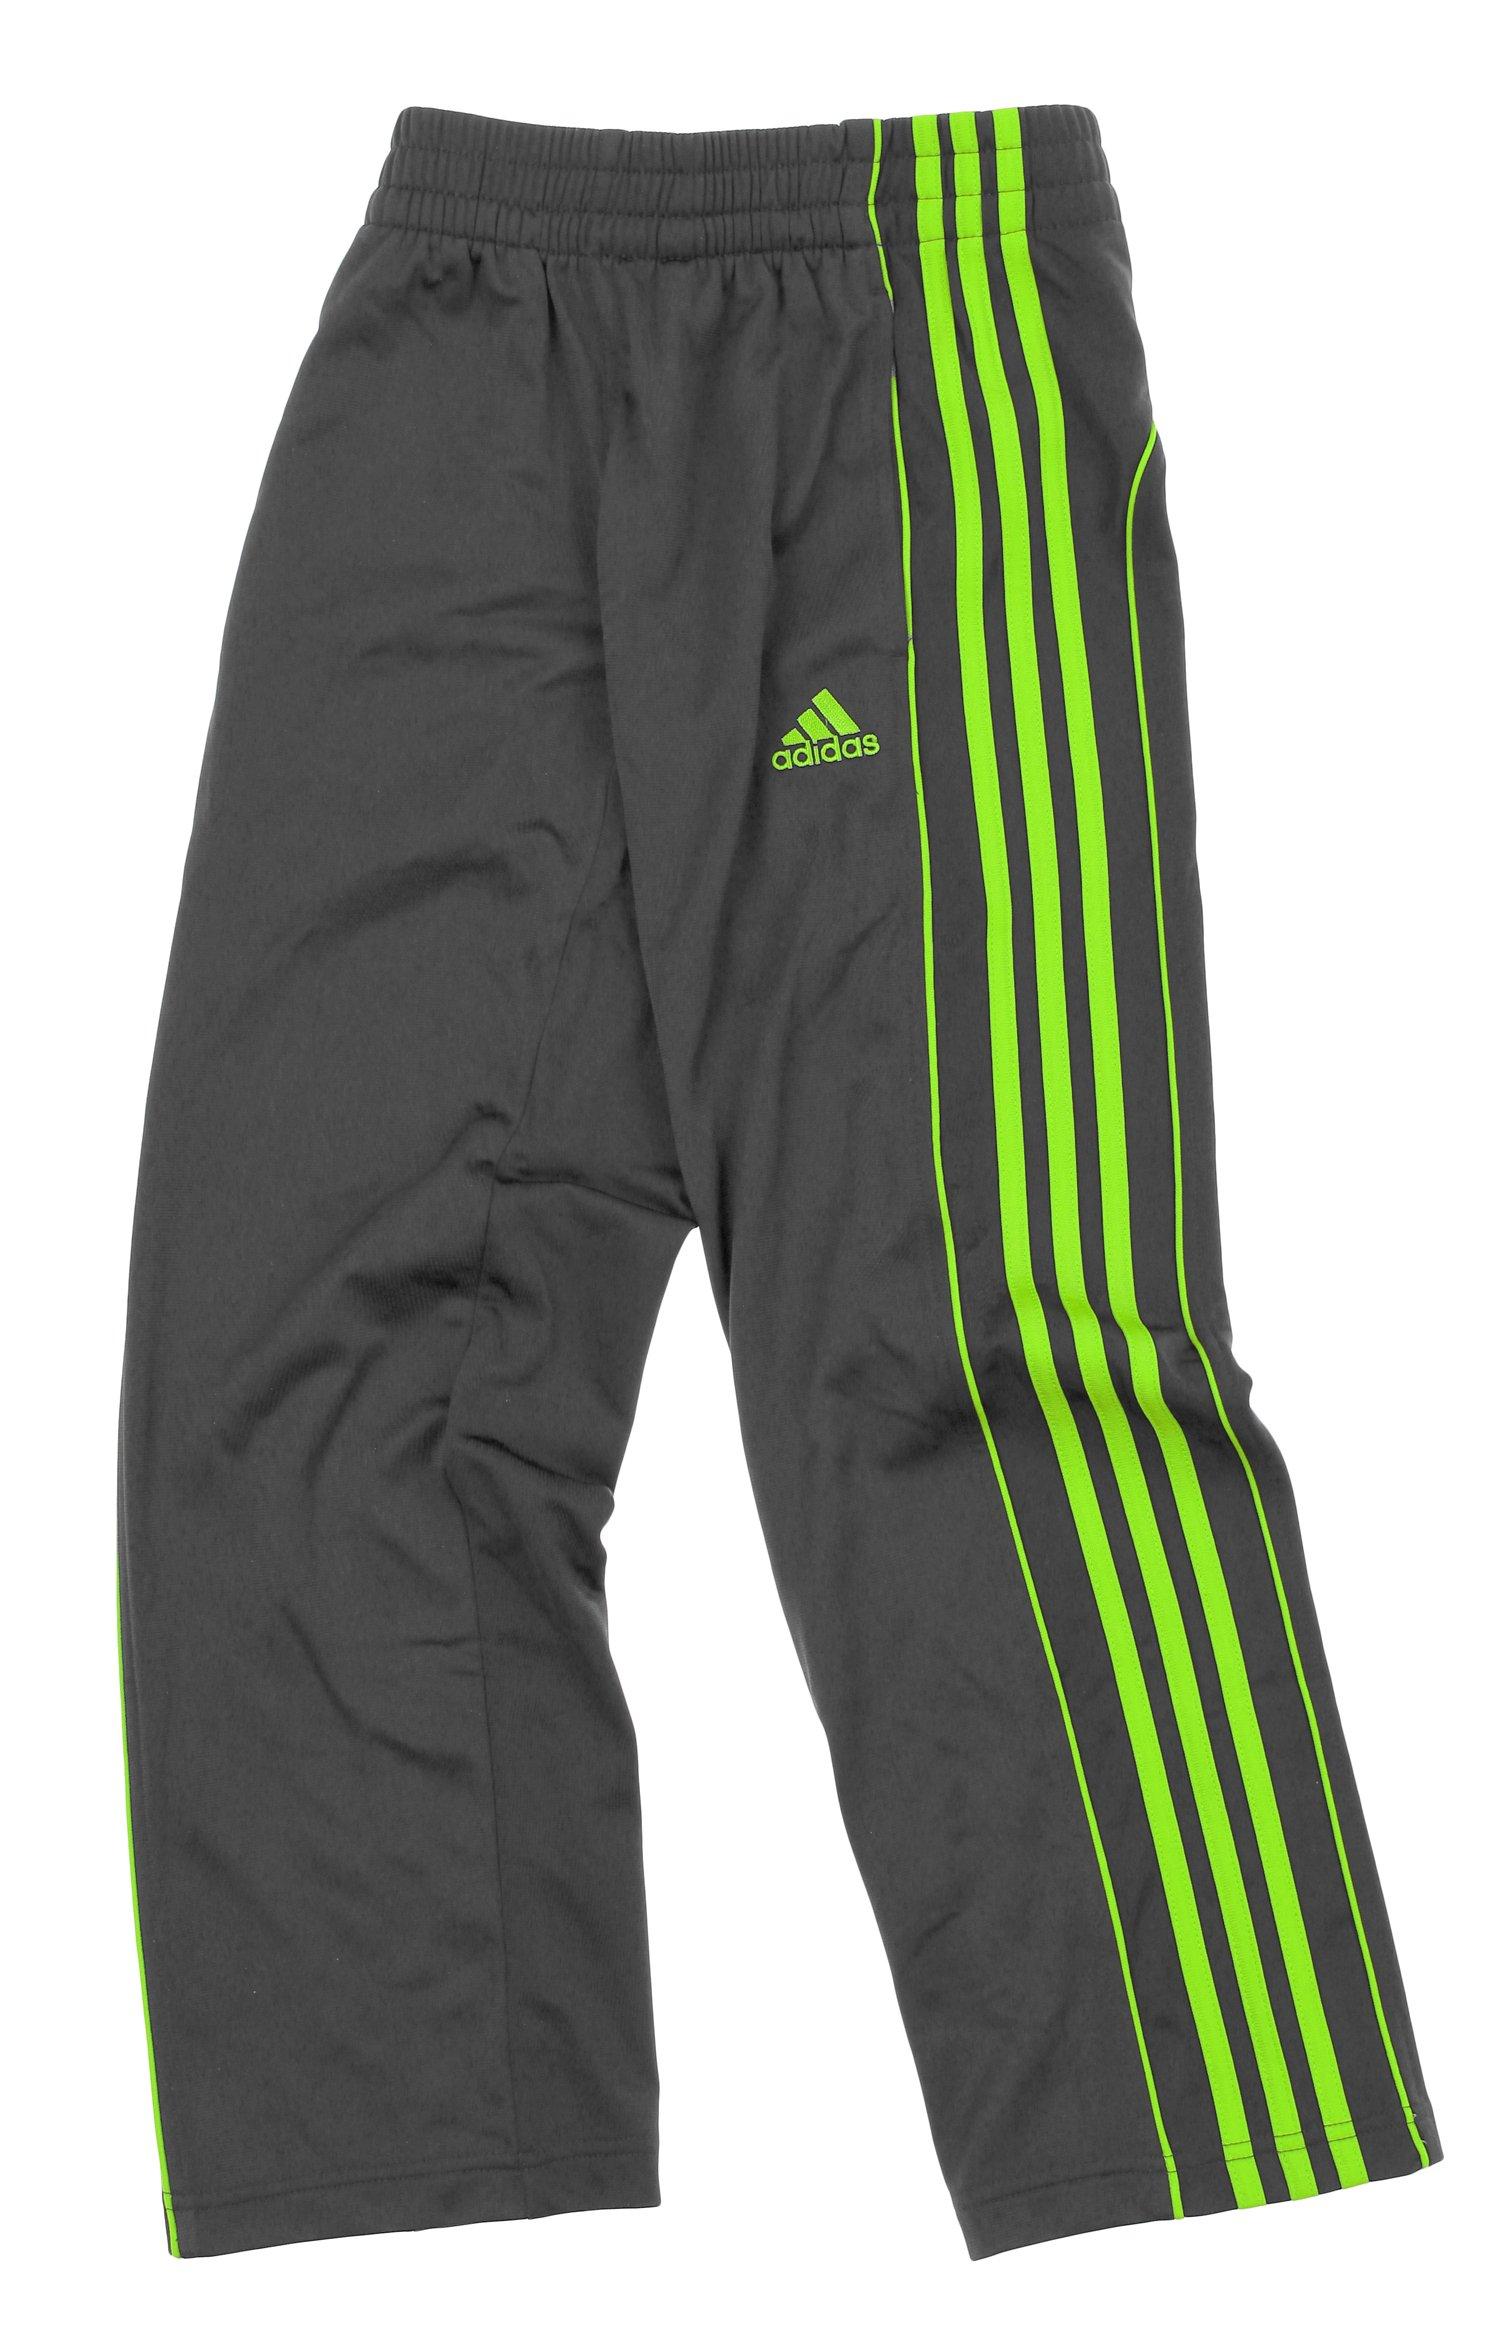 adidas Youth Boys Layup 3-Stripe Track Pant (X-Large (18), Grey/Green) by adidas